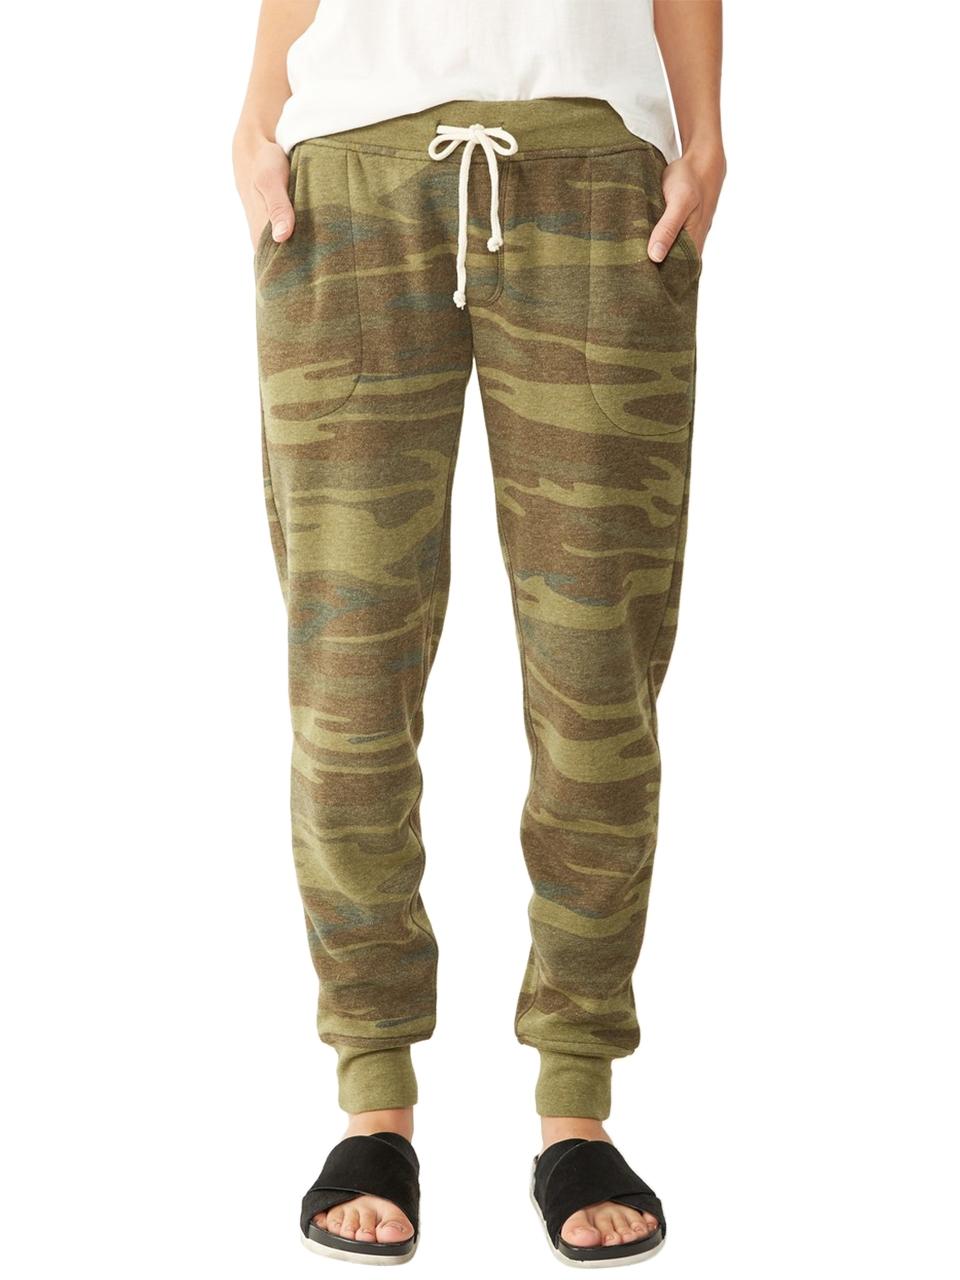 Jogger printed eco fleece pants